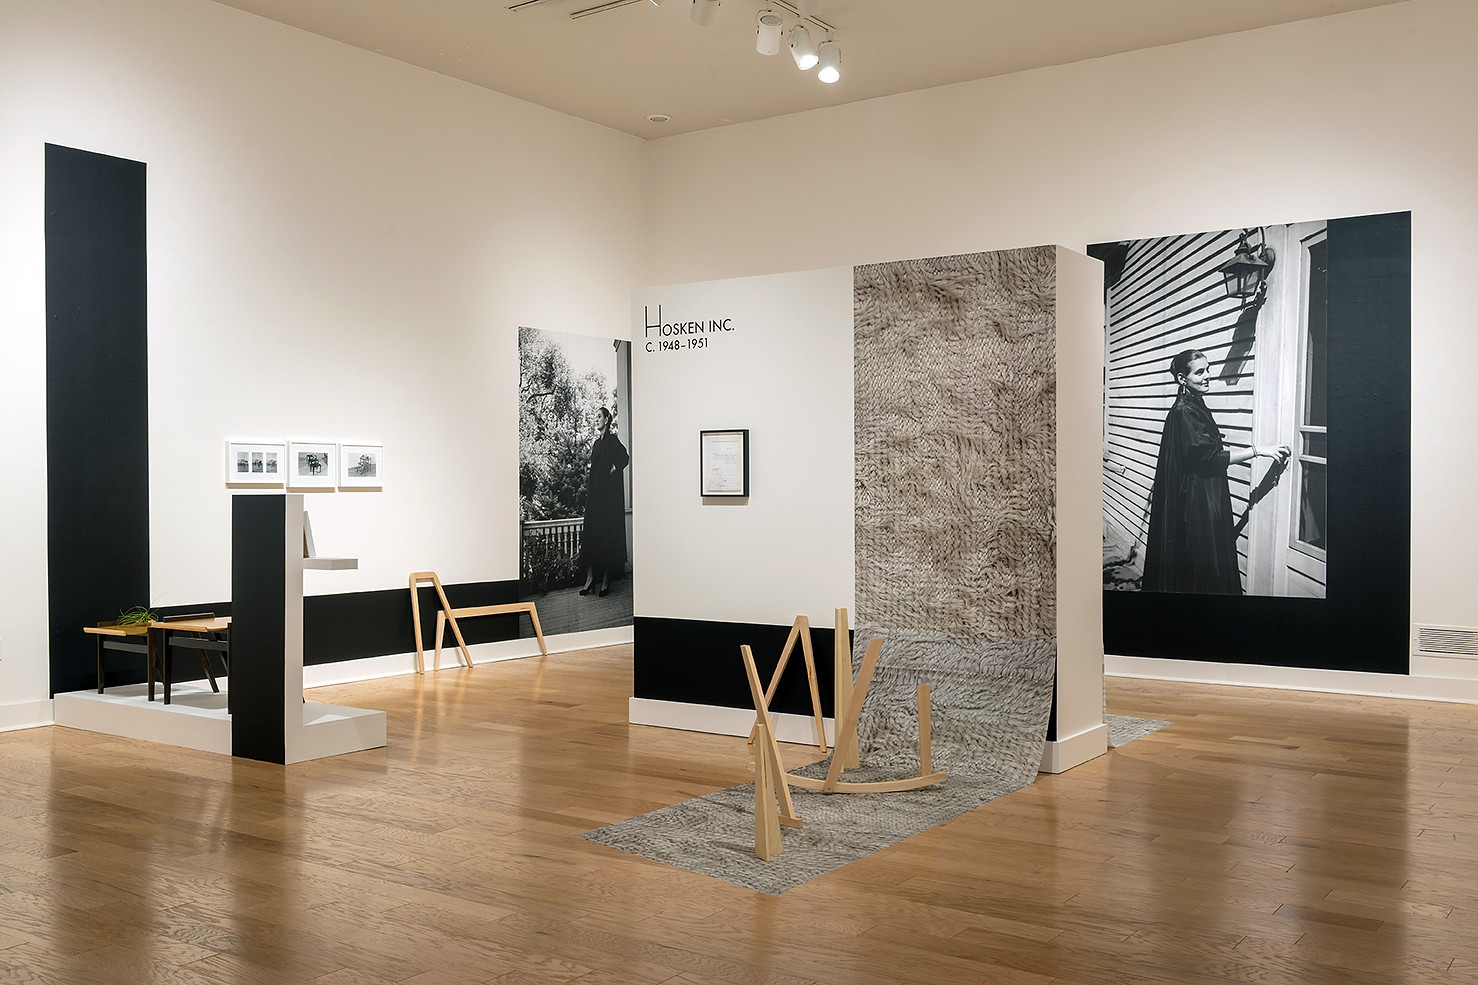 Hosken Inc. ca. 1948-1951, Interior Effects, 2017, Fitchburg Art Museum, 2018, Wood, furniture, silver gelatin prints, vinyl letters, digital images